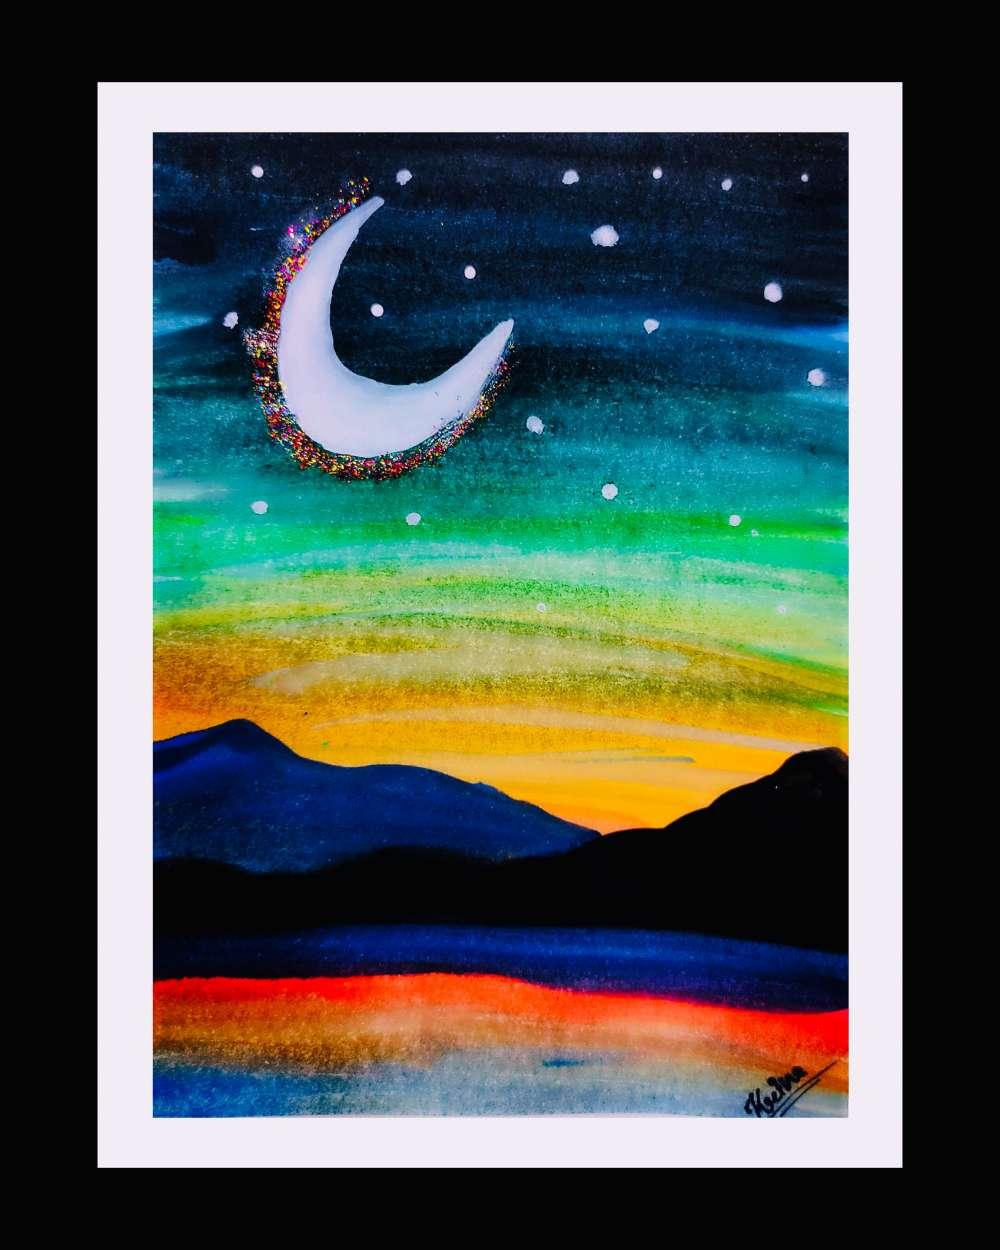 Night watercolour painting